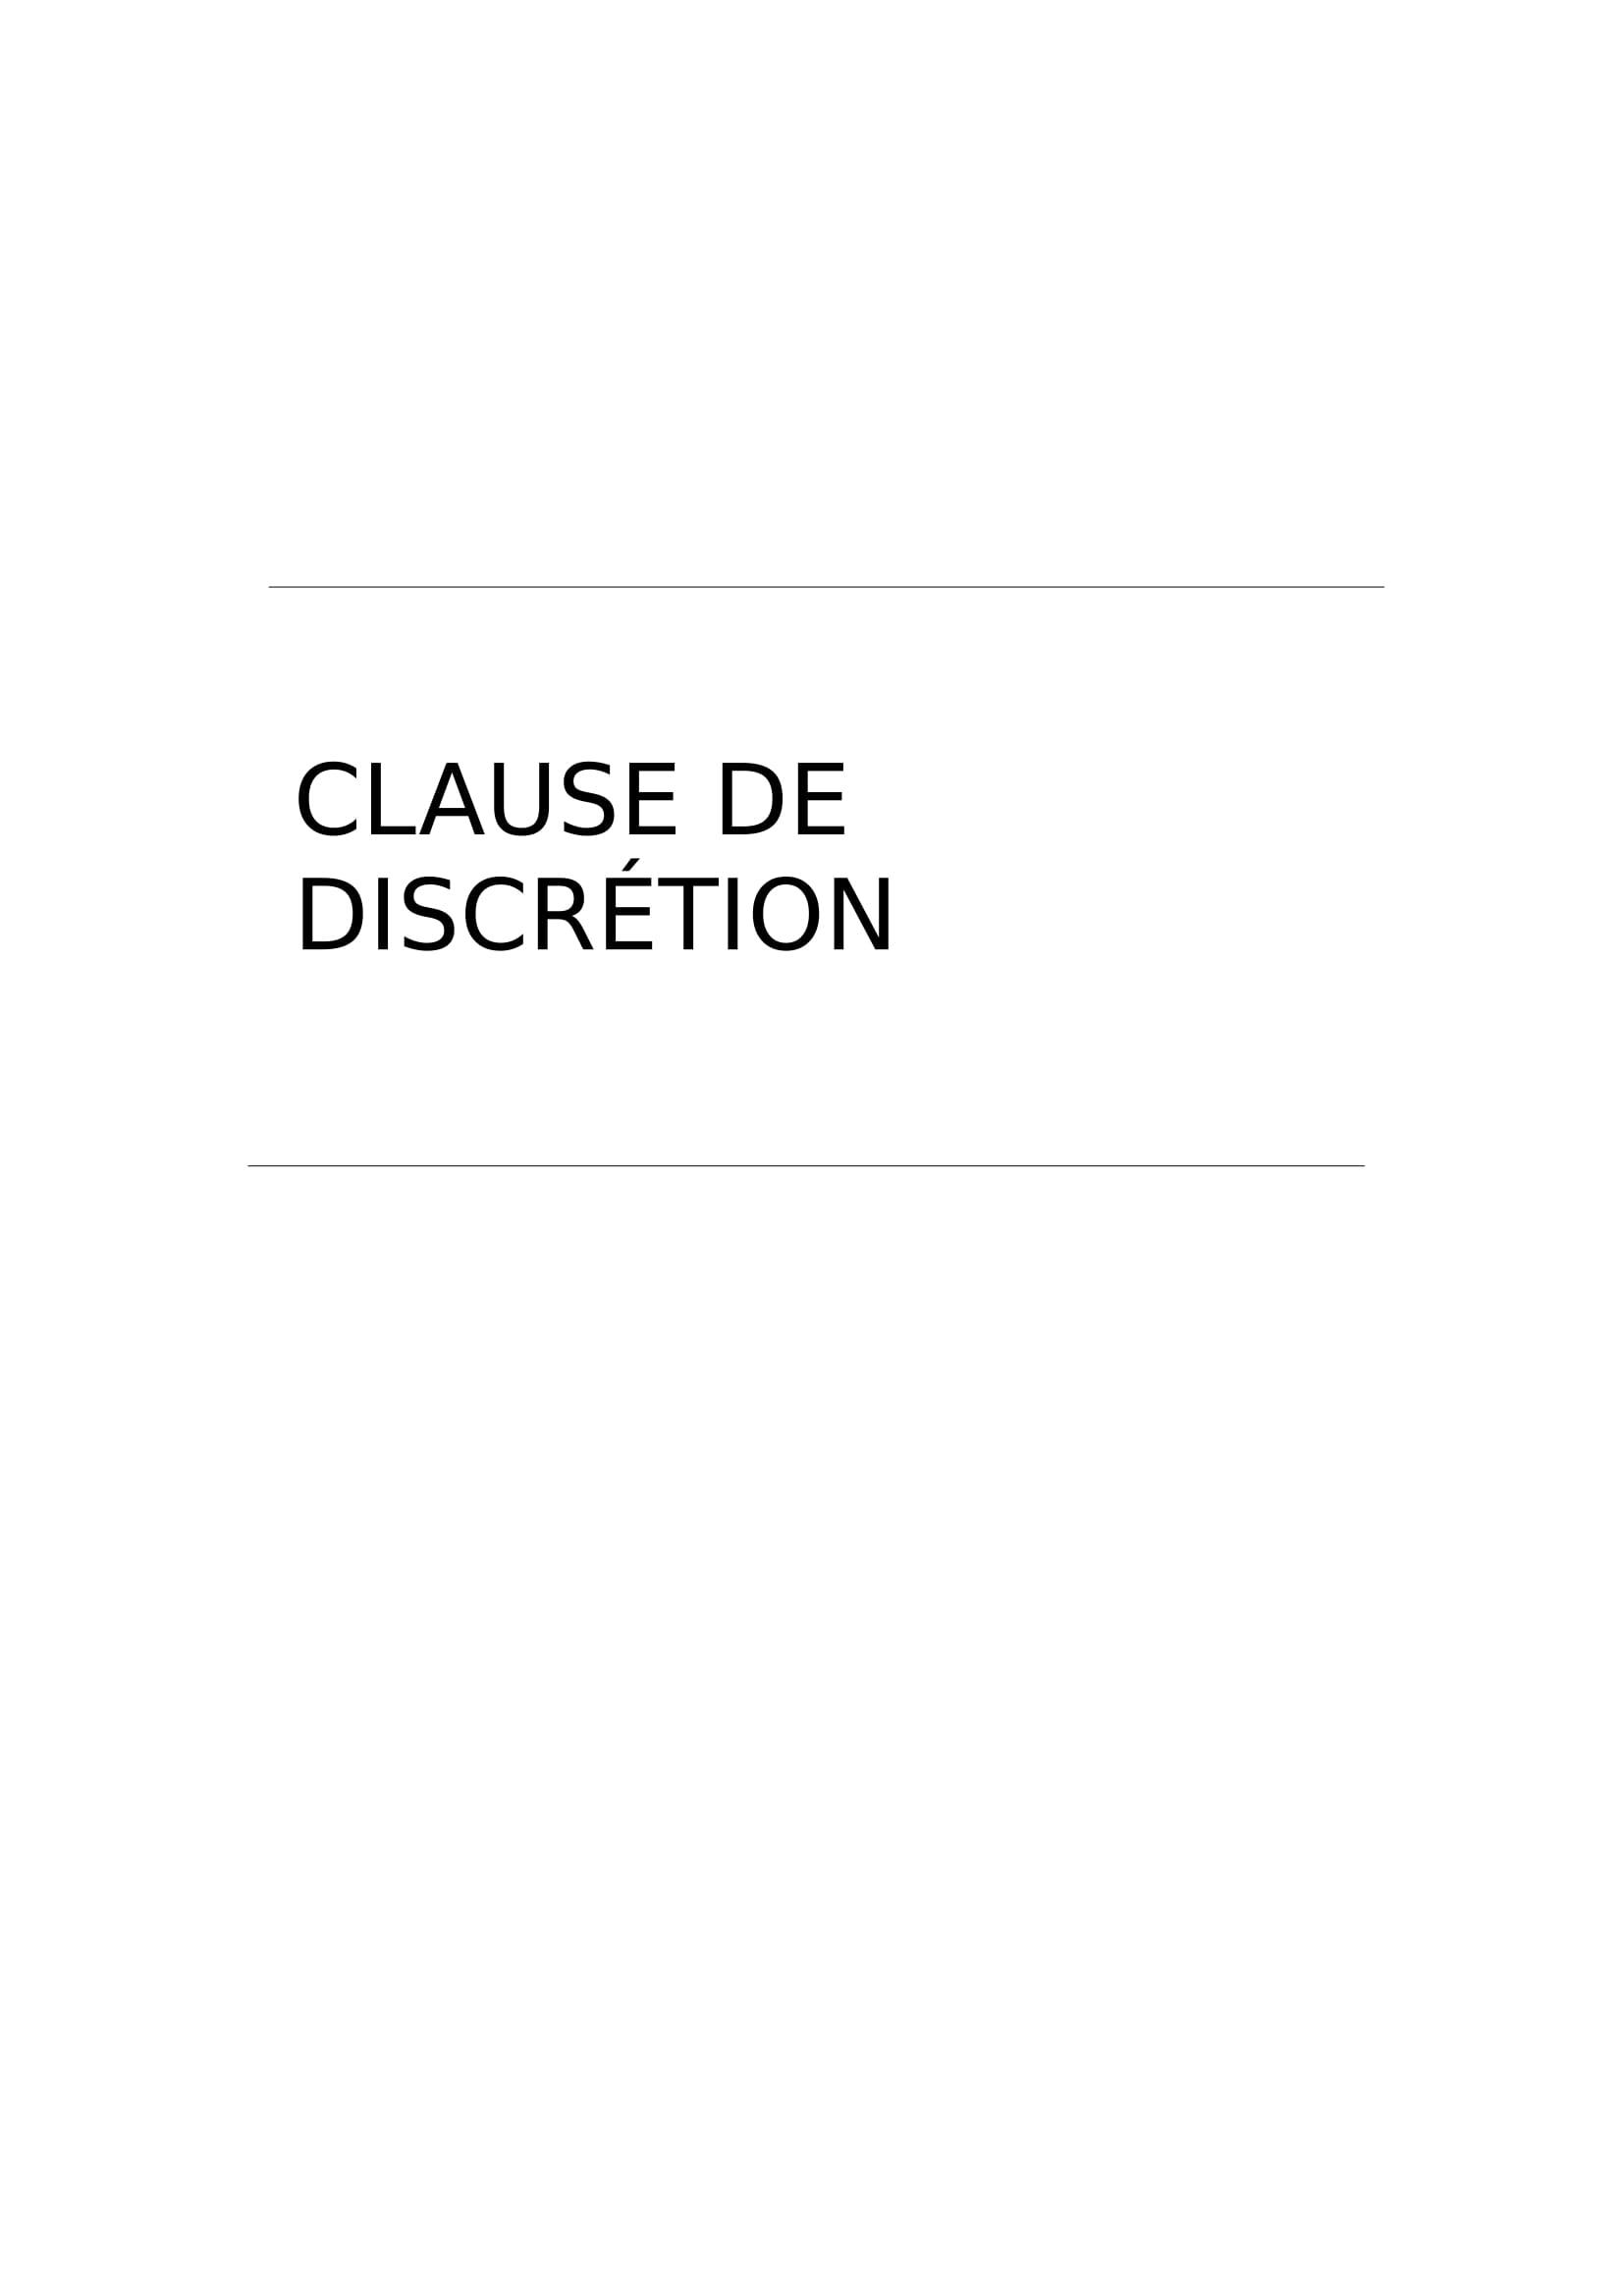 Modele De Clause De Discretion Gratuit